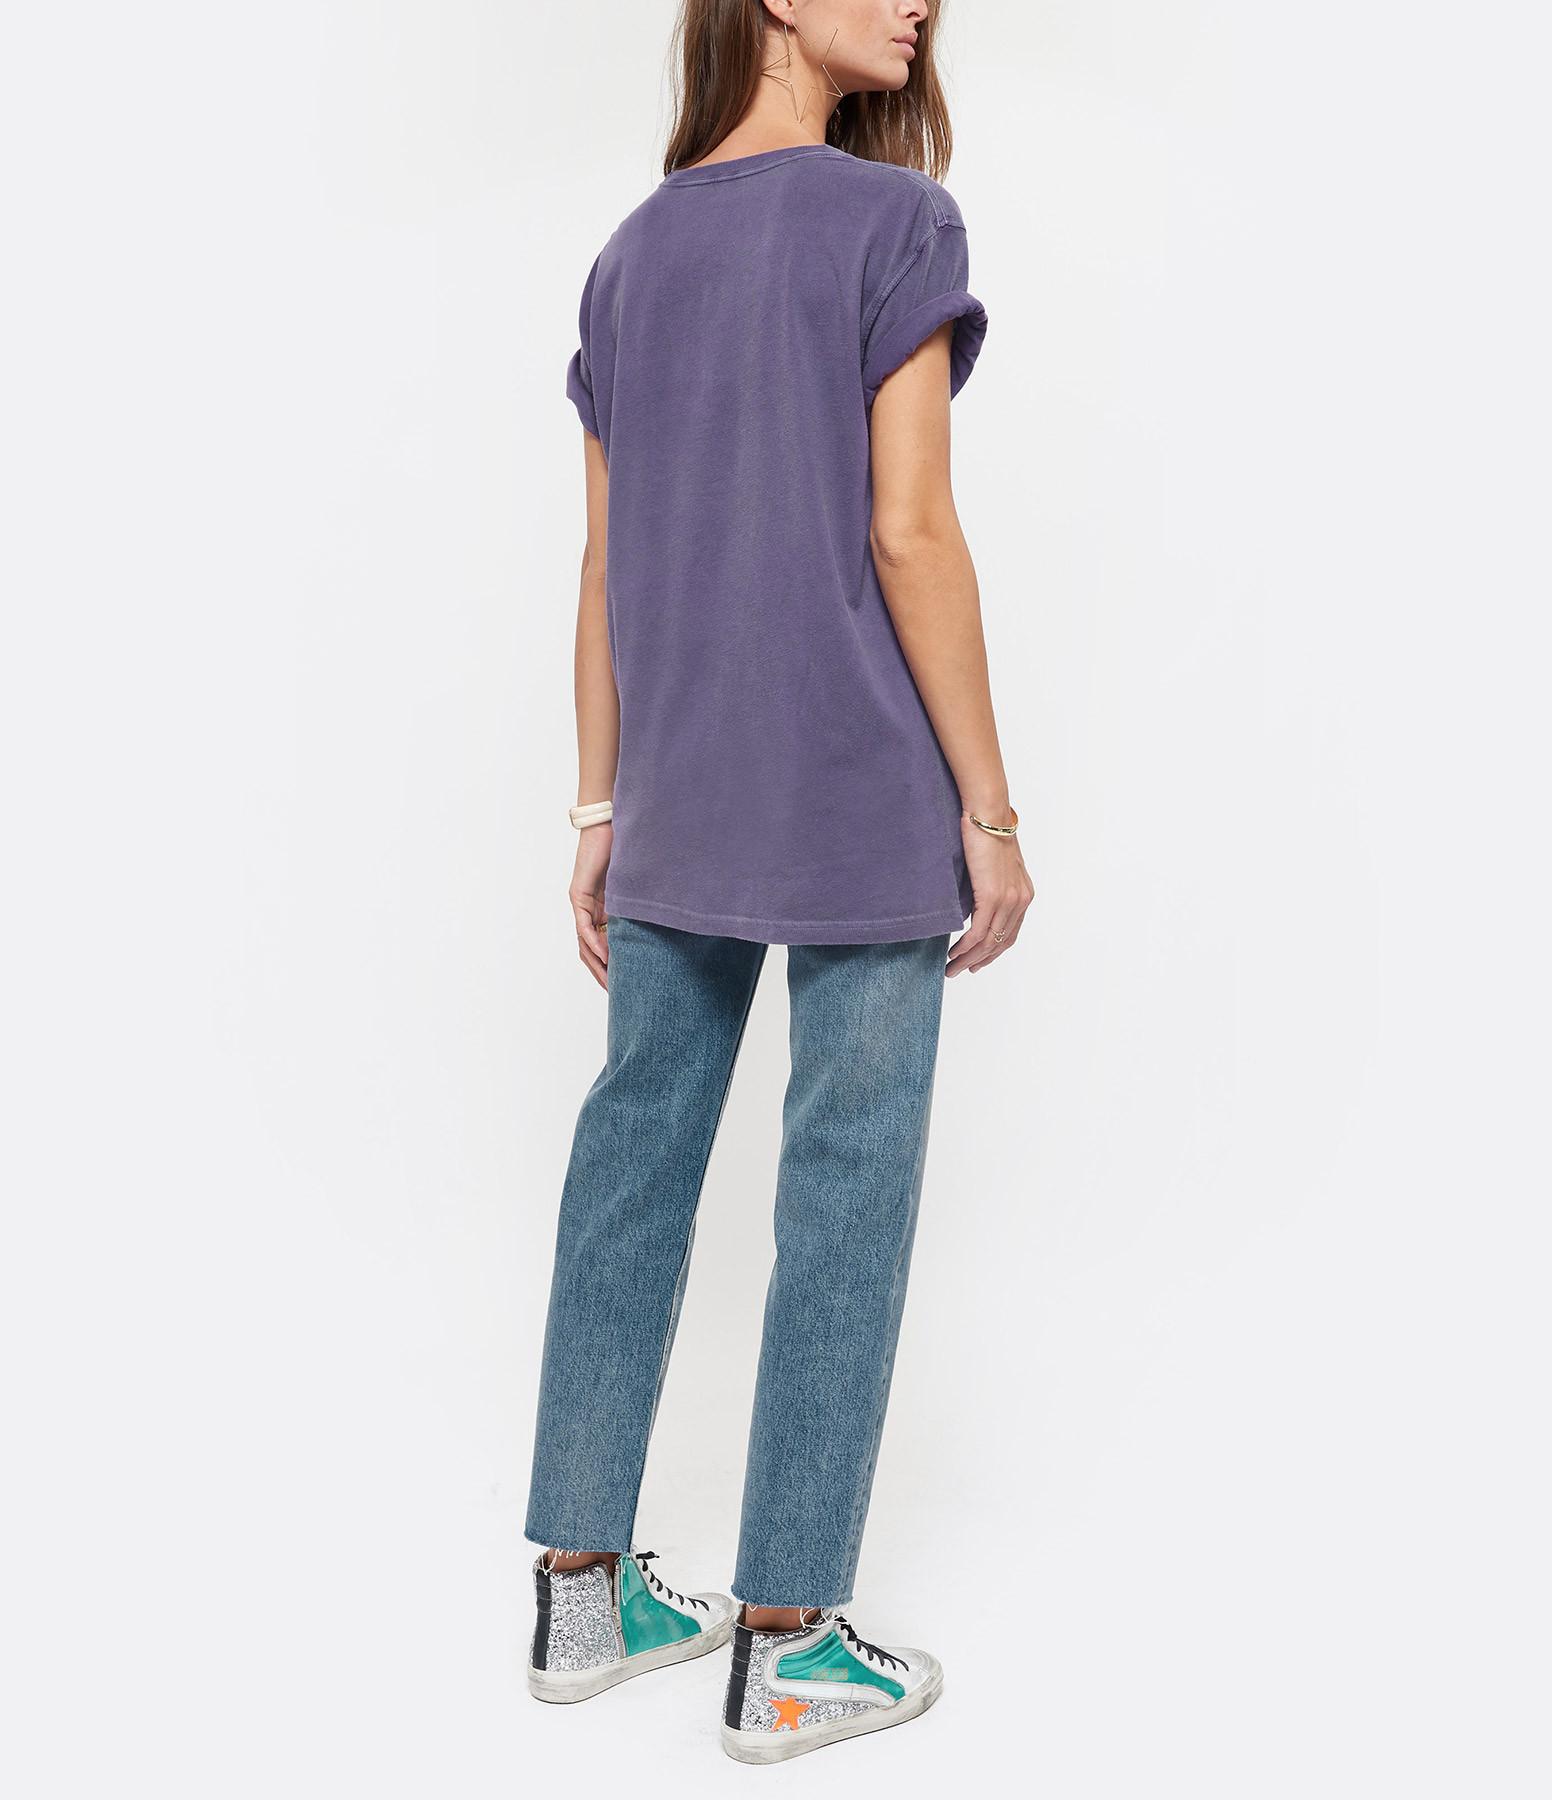 NEWTONE - Tee-shirt Kiss Me Coton Violet Grappe